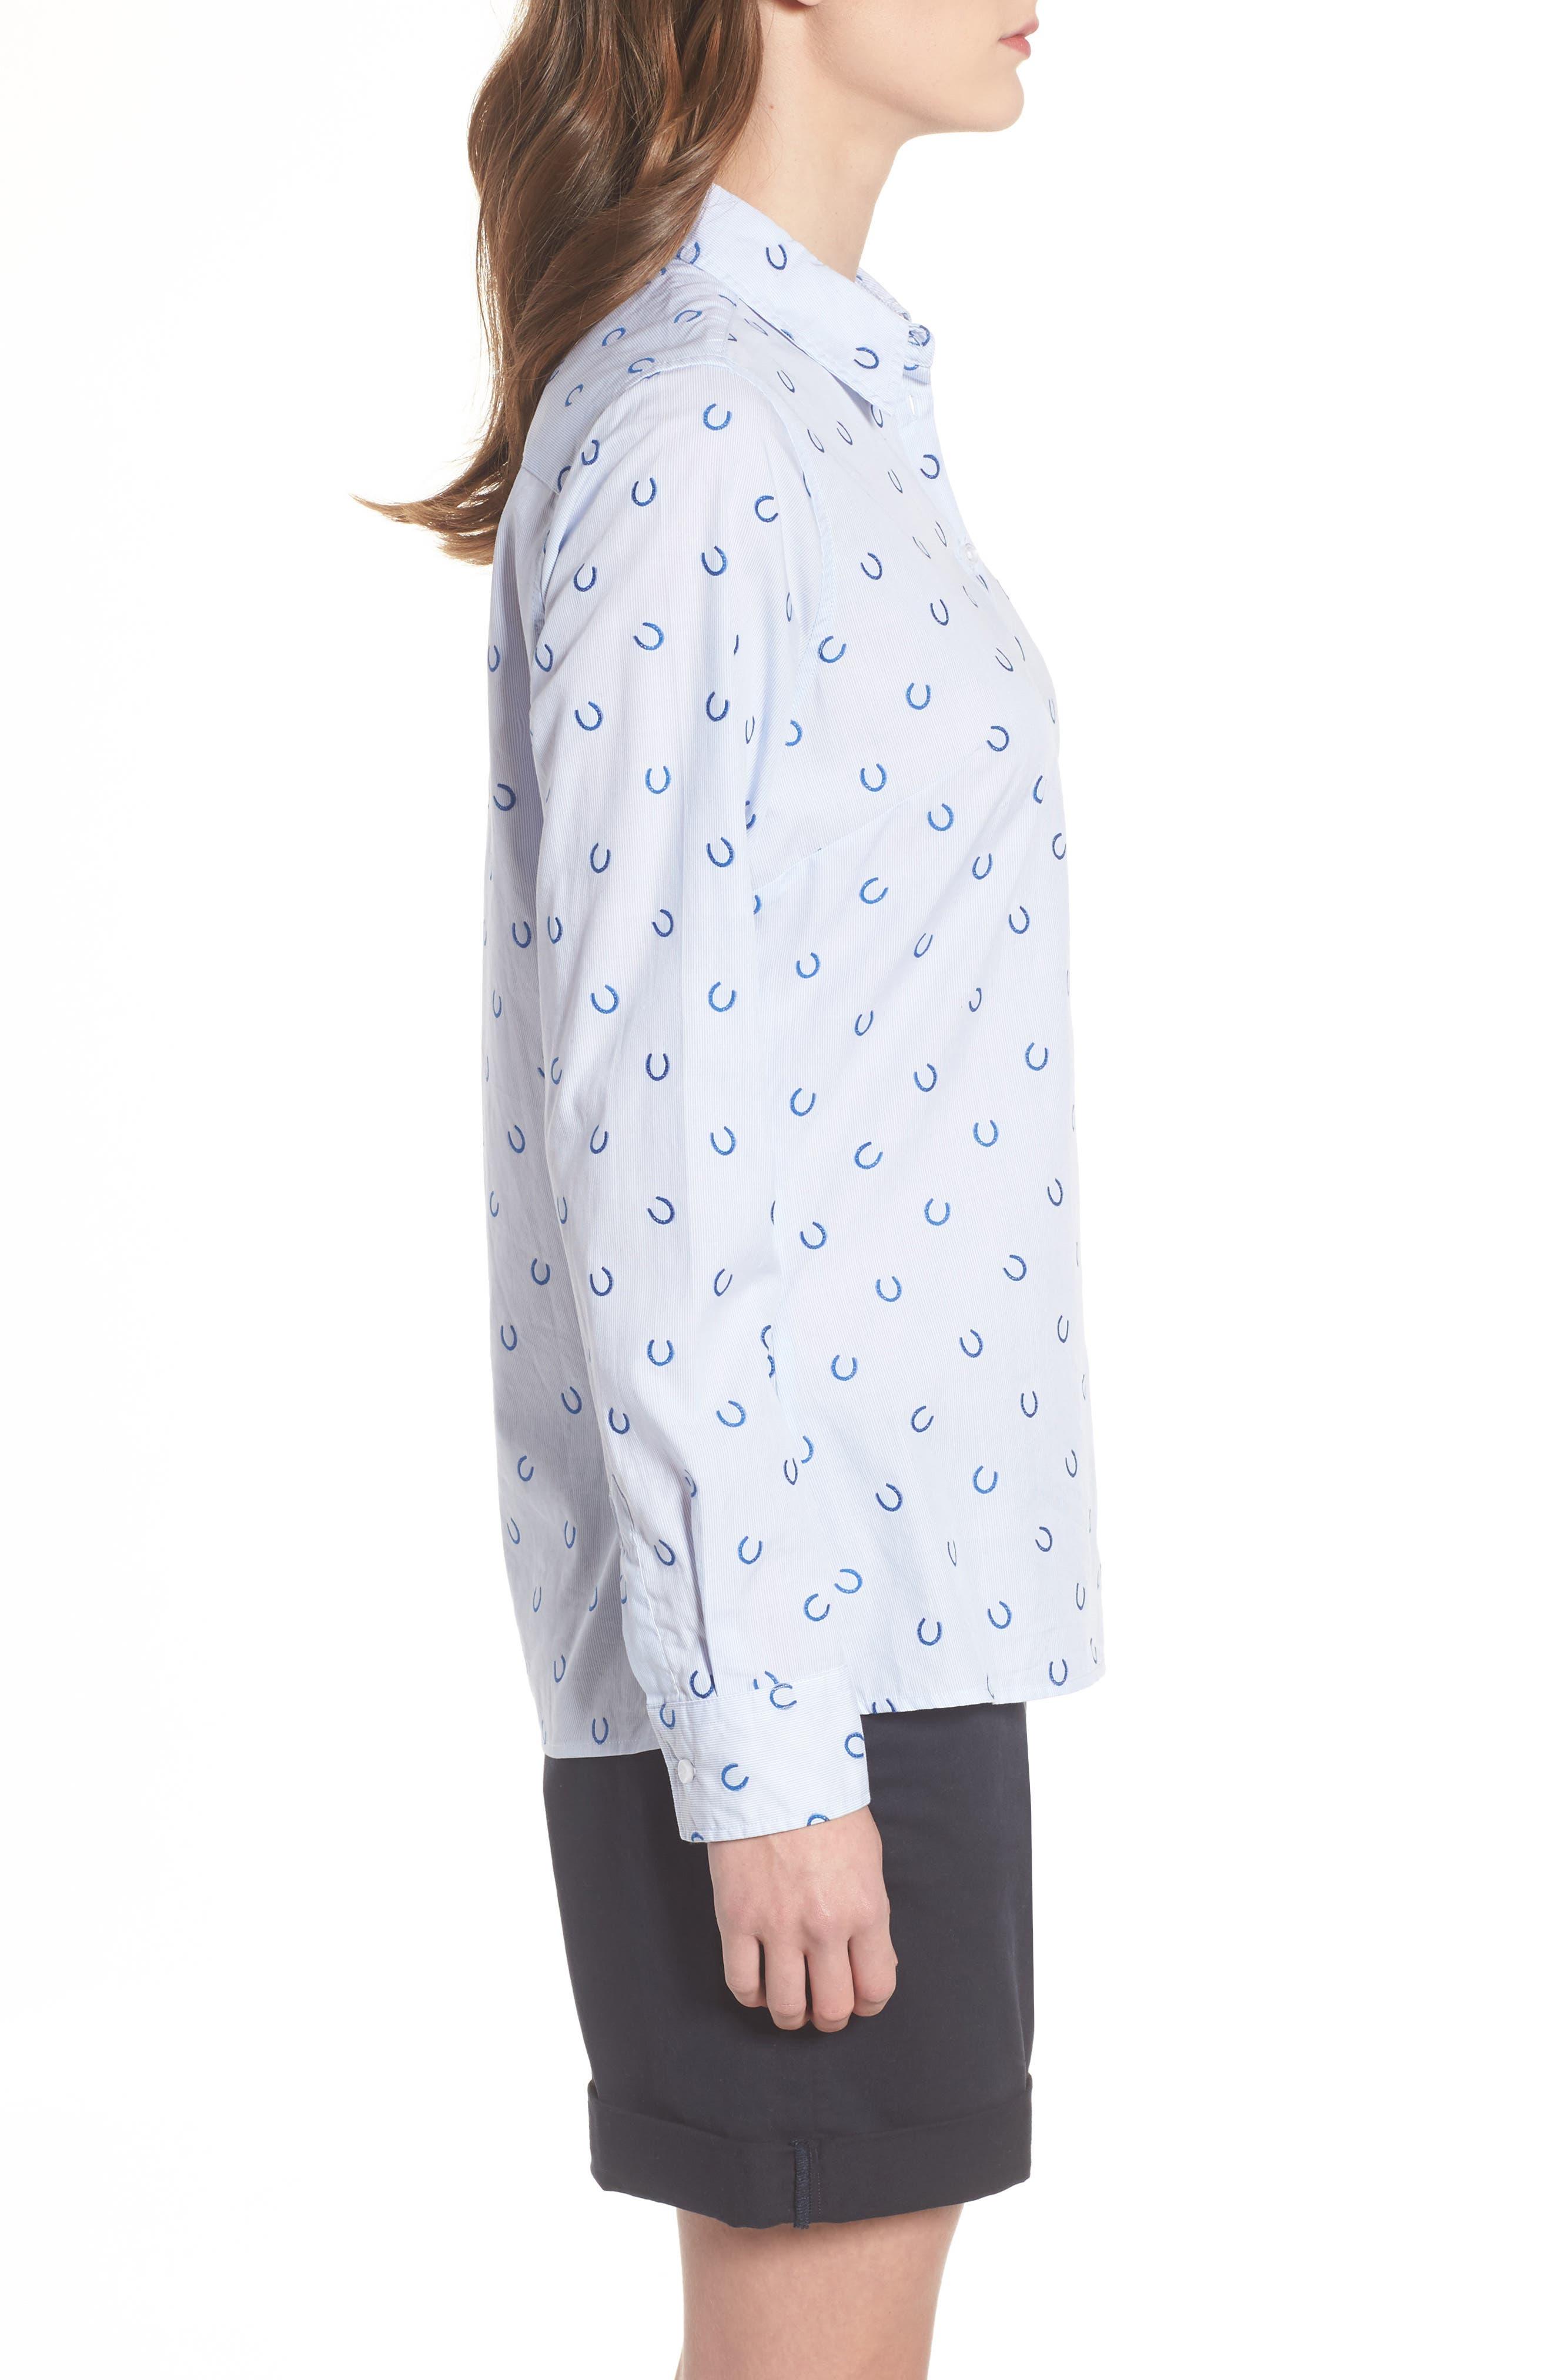 Daisyhill Regular Fit Shirt,                             Alternate thumbnail 3, color,                             Pale Blue